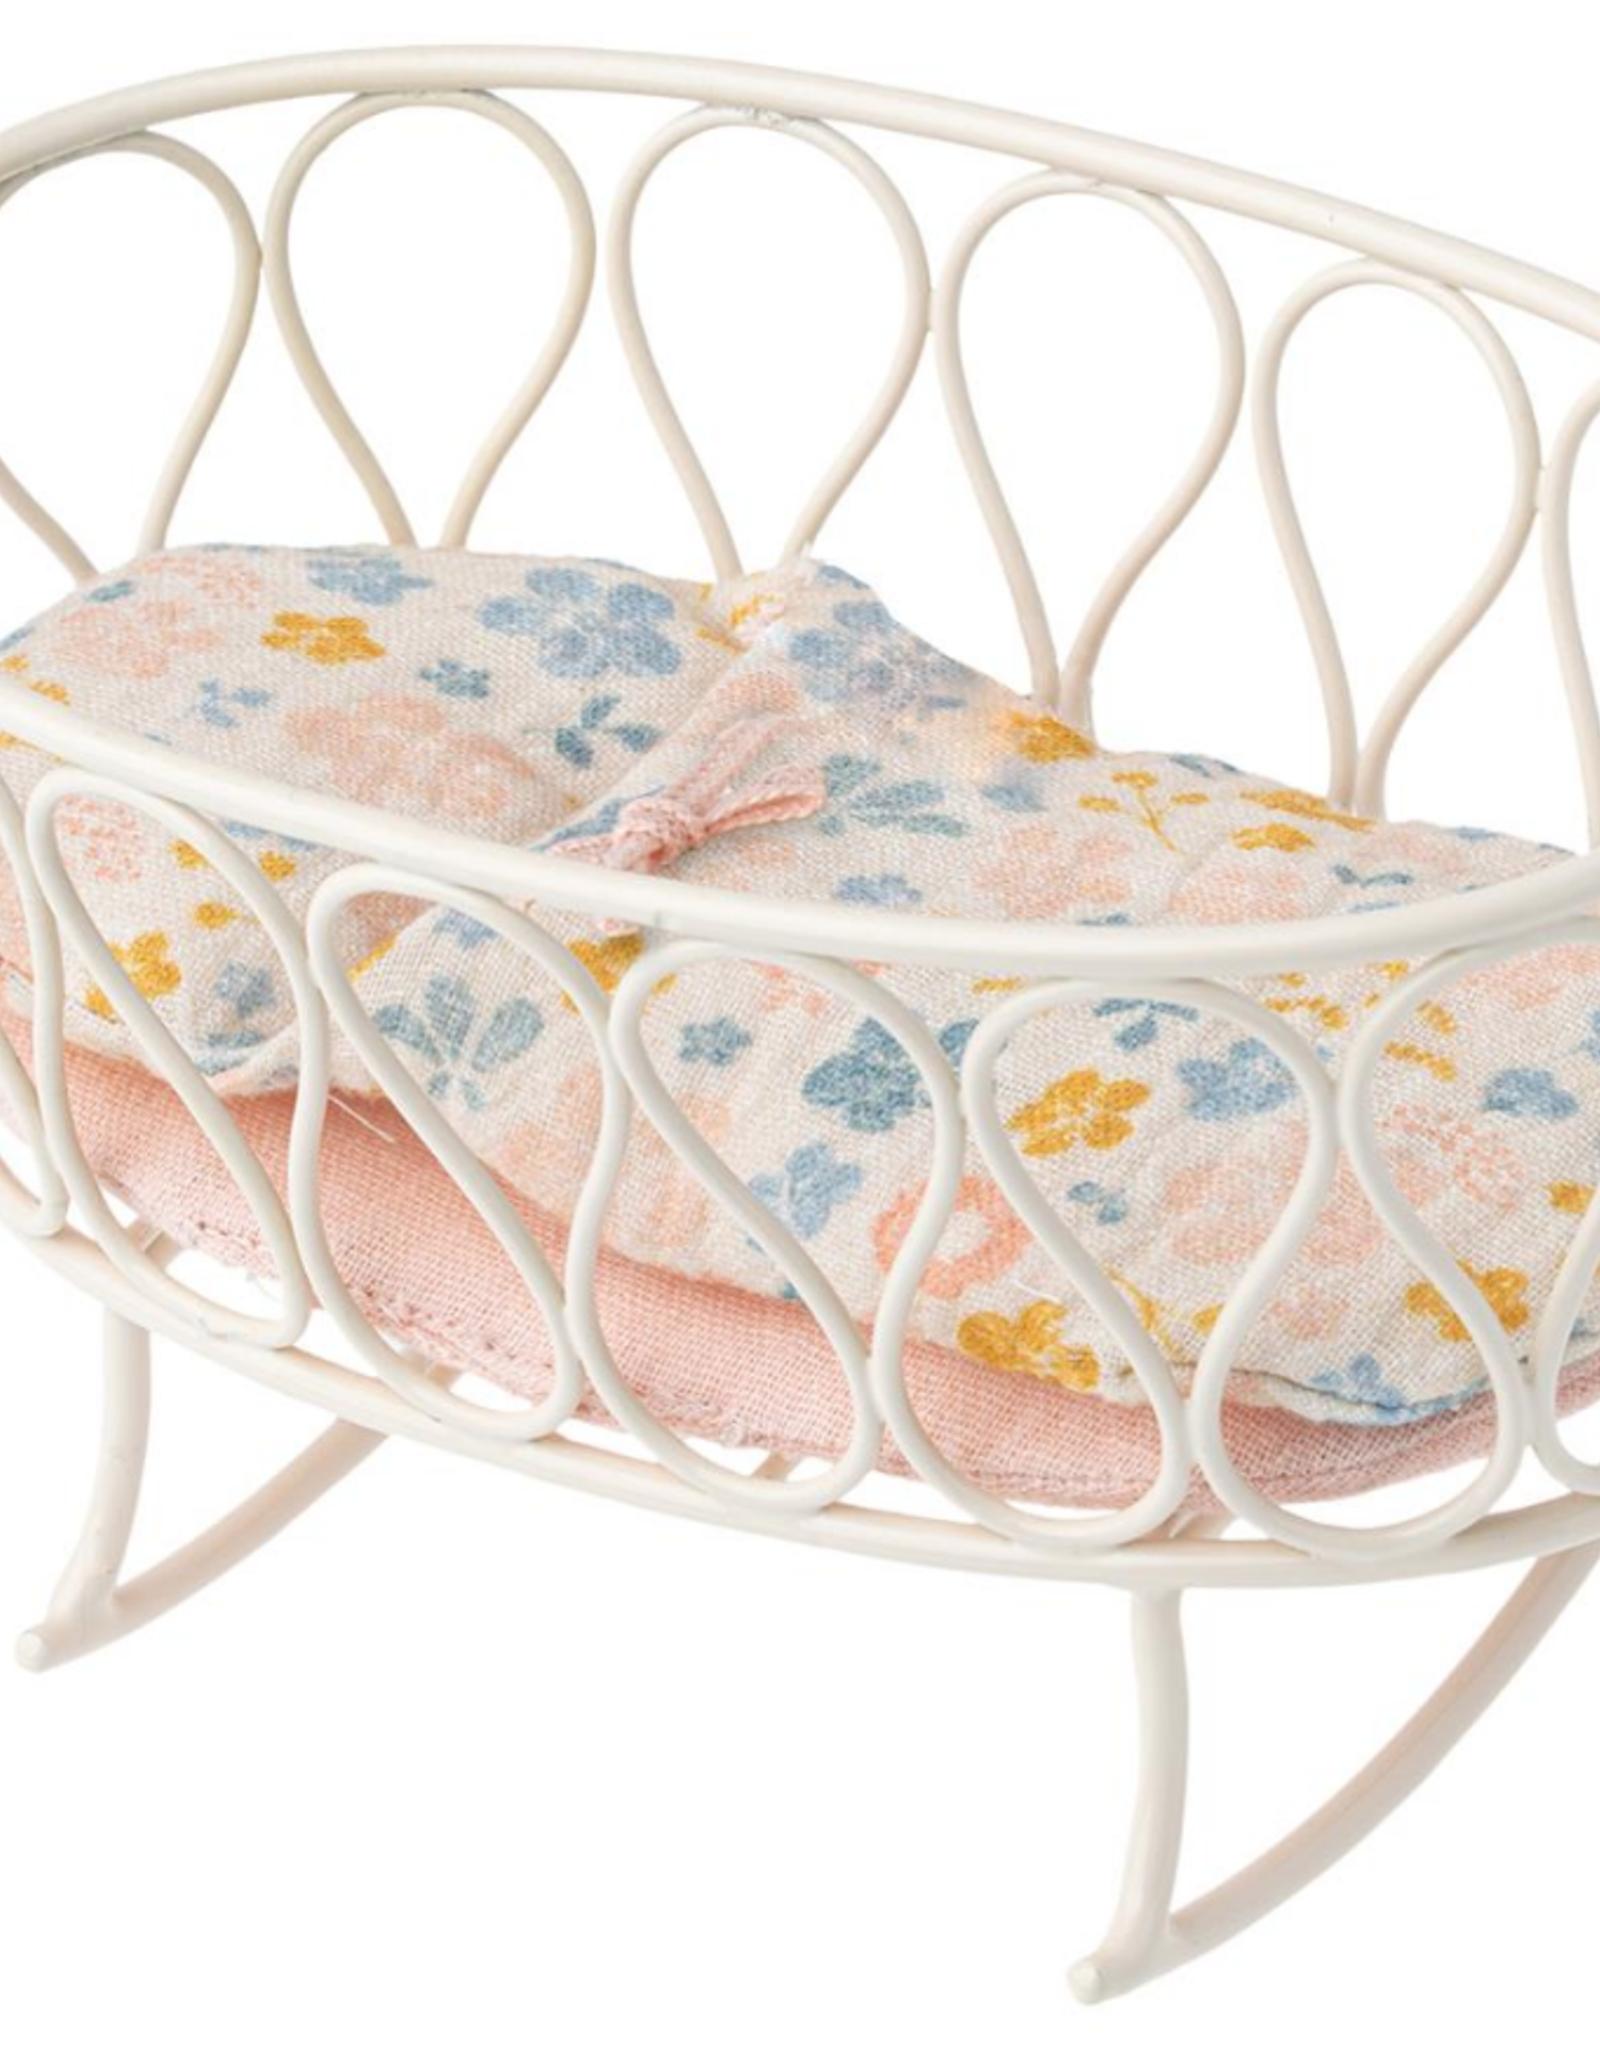 Maileg Maileg - Cradle with Sleeping Bag - Micro - Off White